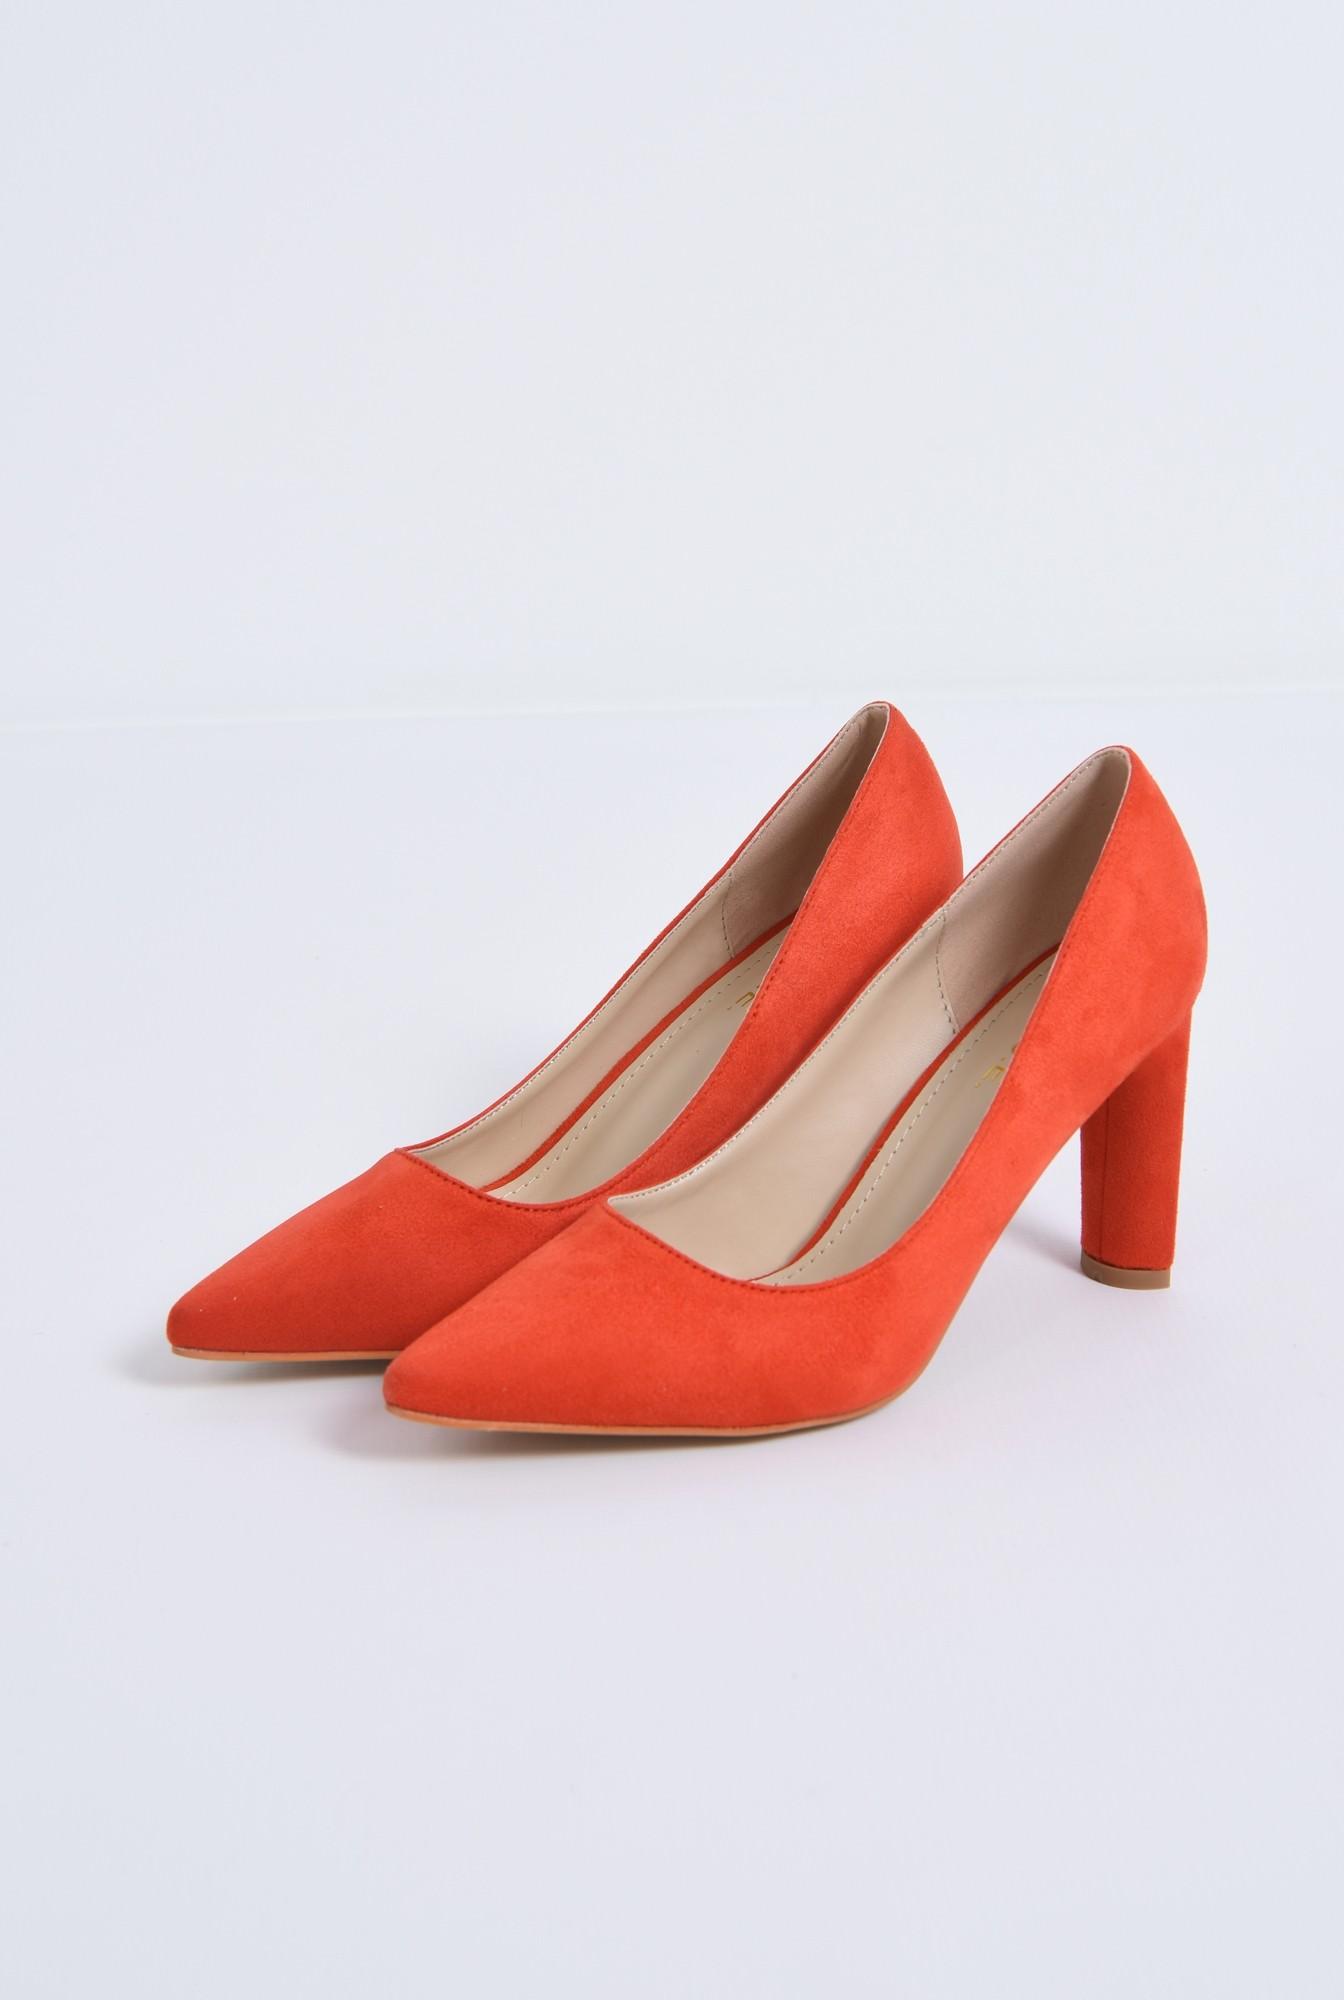 1 - pantofi casual, rosu, toc inalt